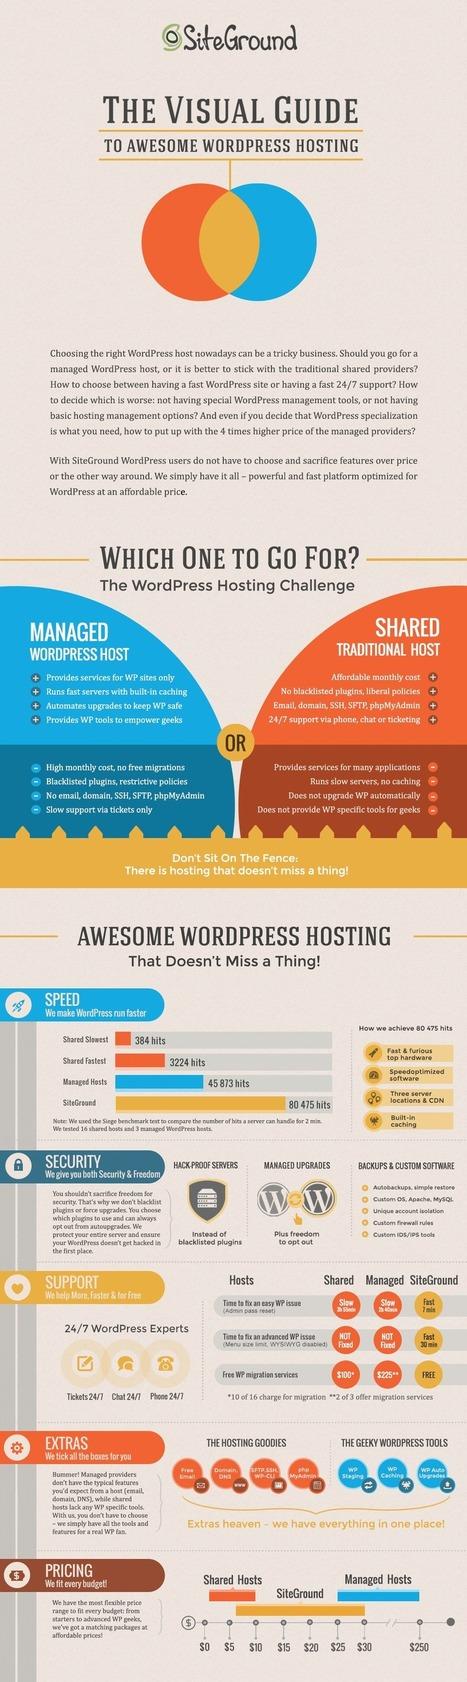 The Best WordPress Hosting 2014 | Affiliate Marketing | Scoop.it